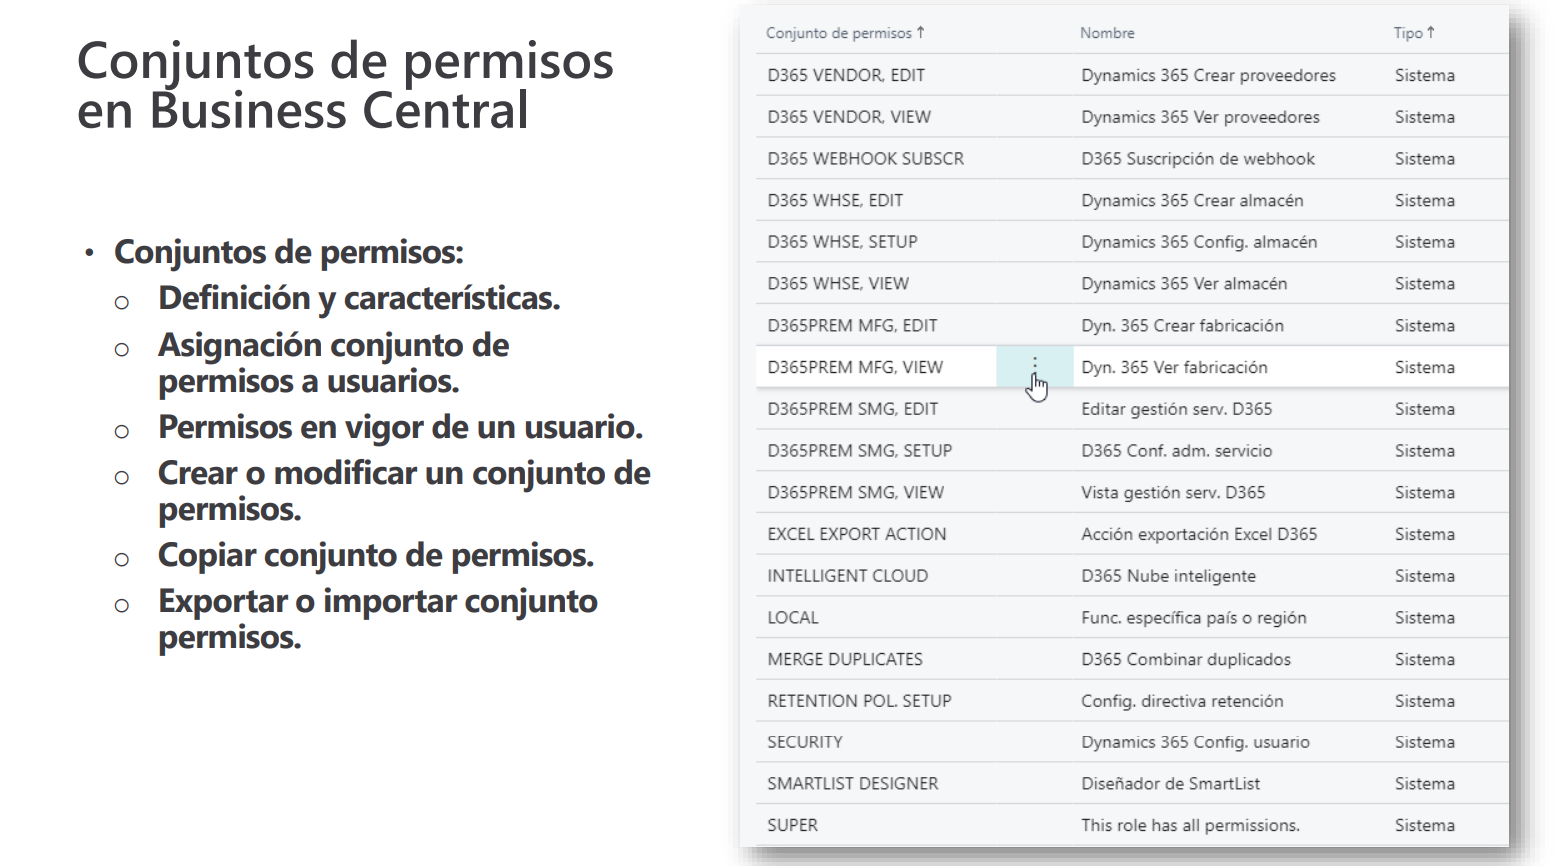 webinar_roles_permisos_business_central_2